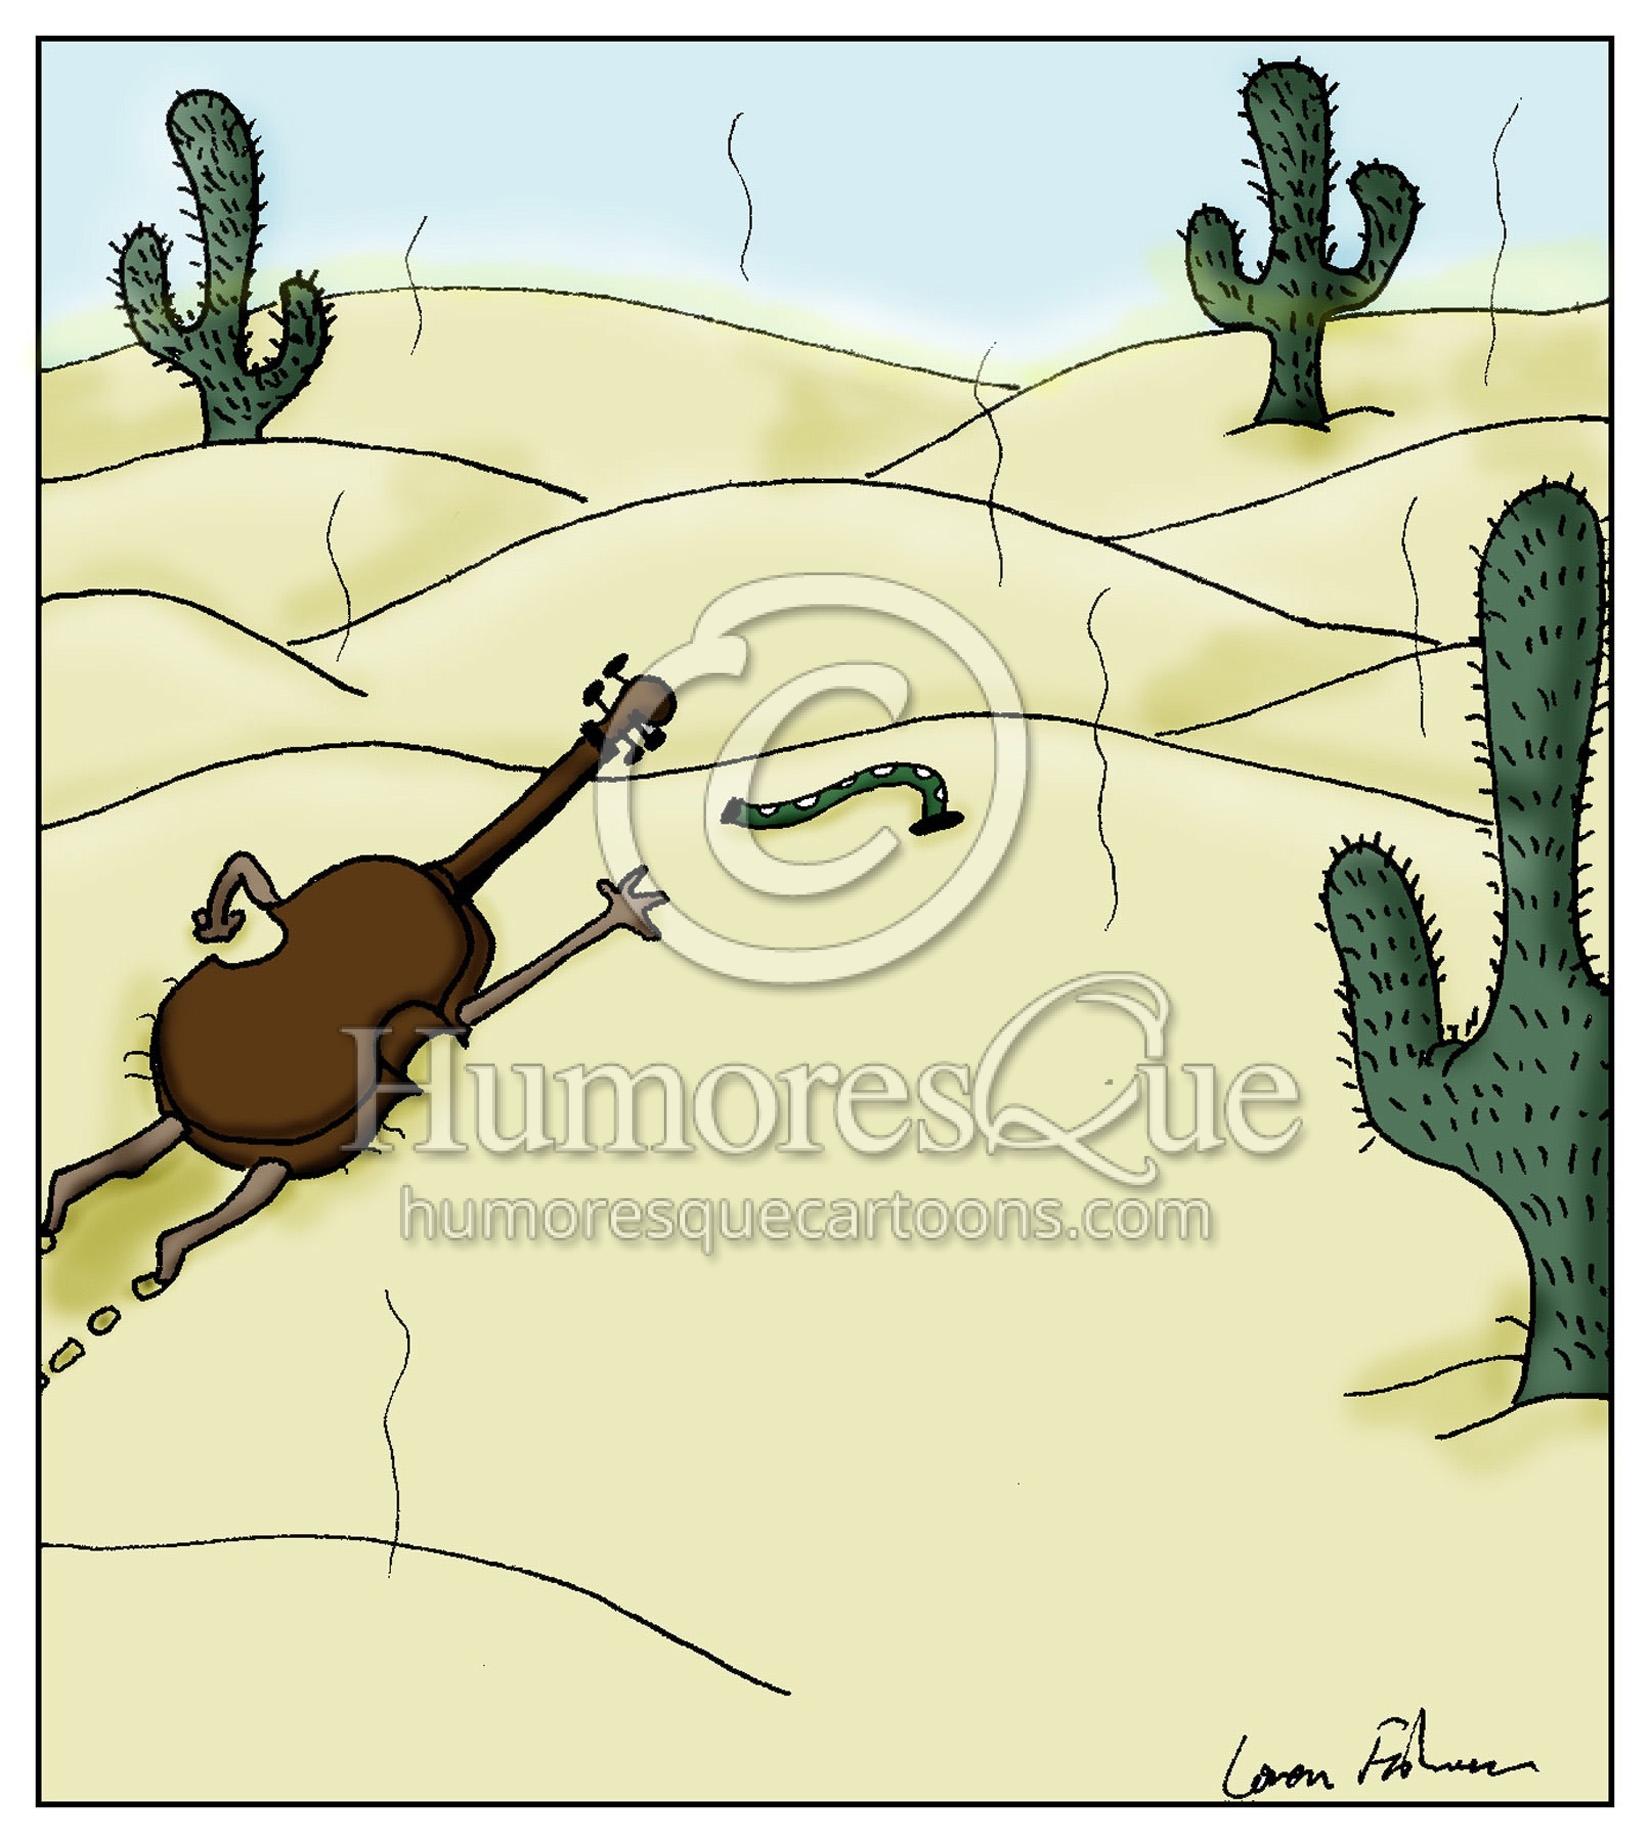 violin in the desert crawling toward a dampit cartoon